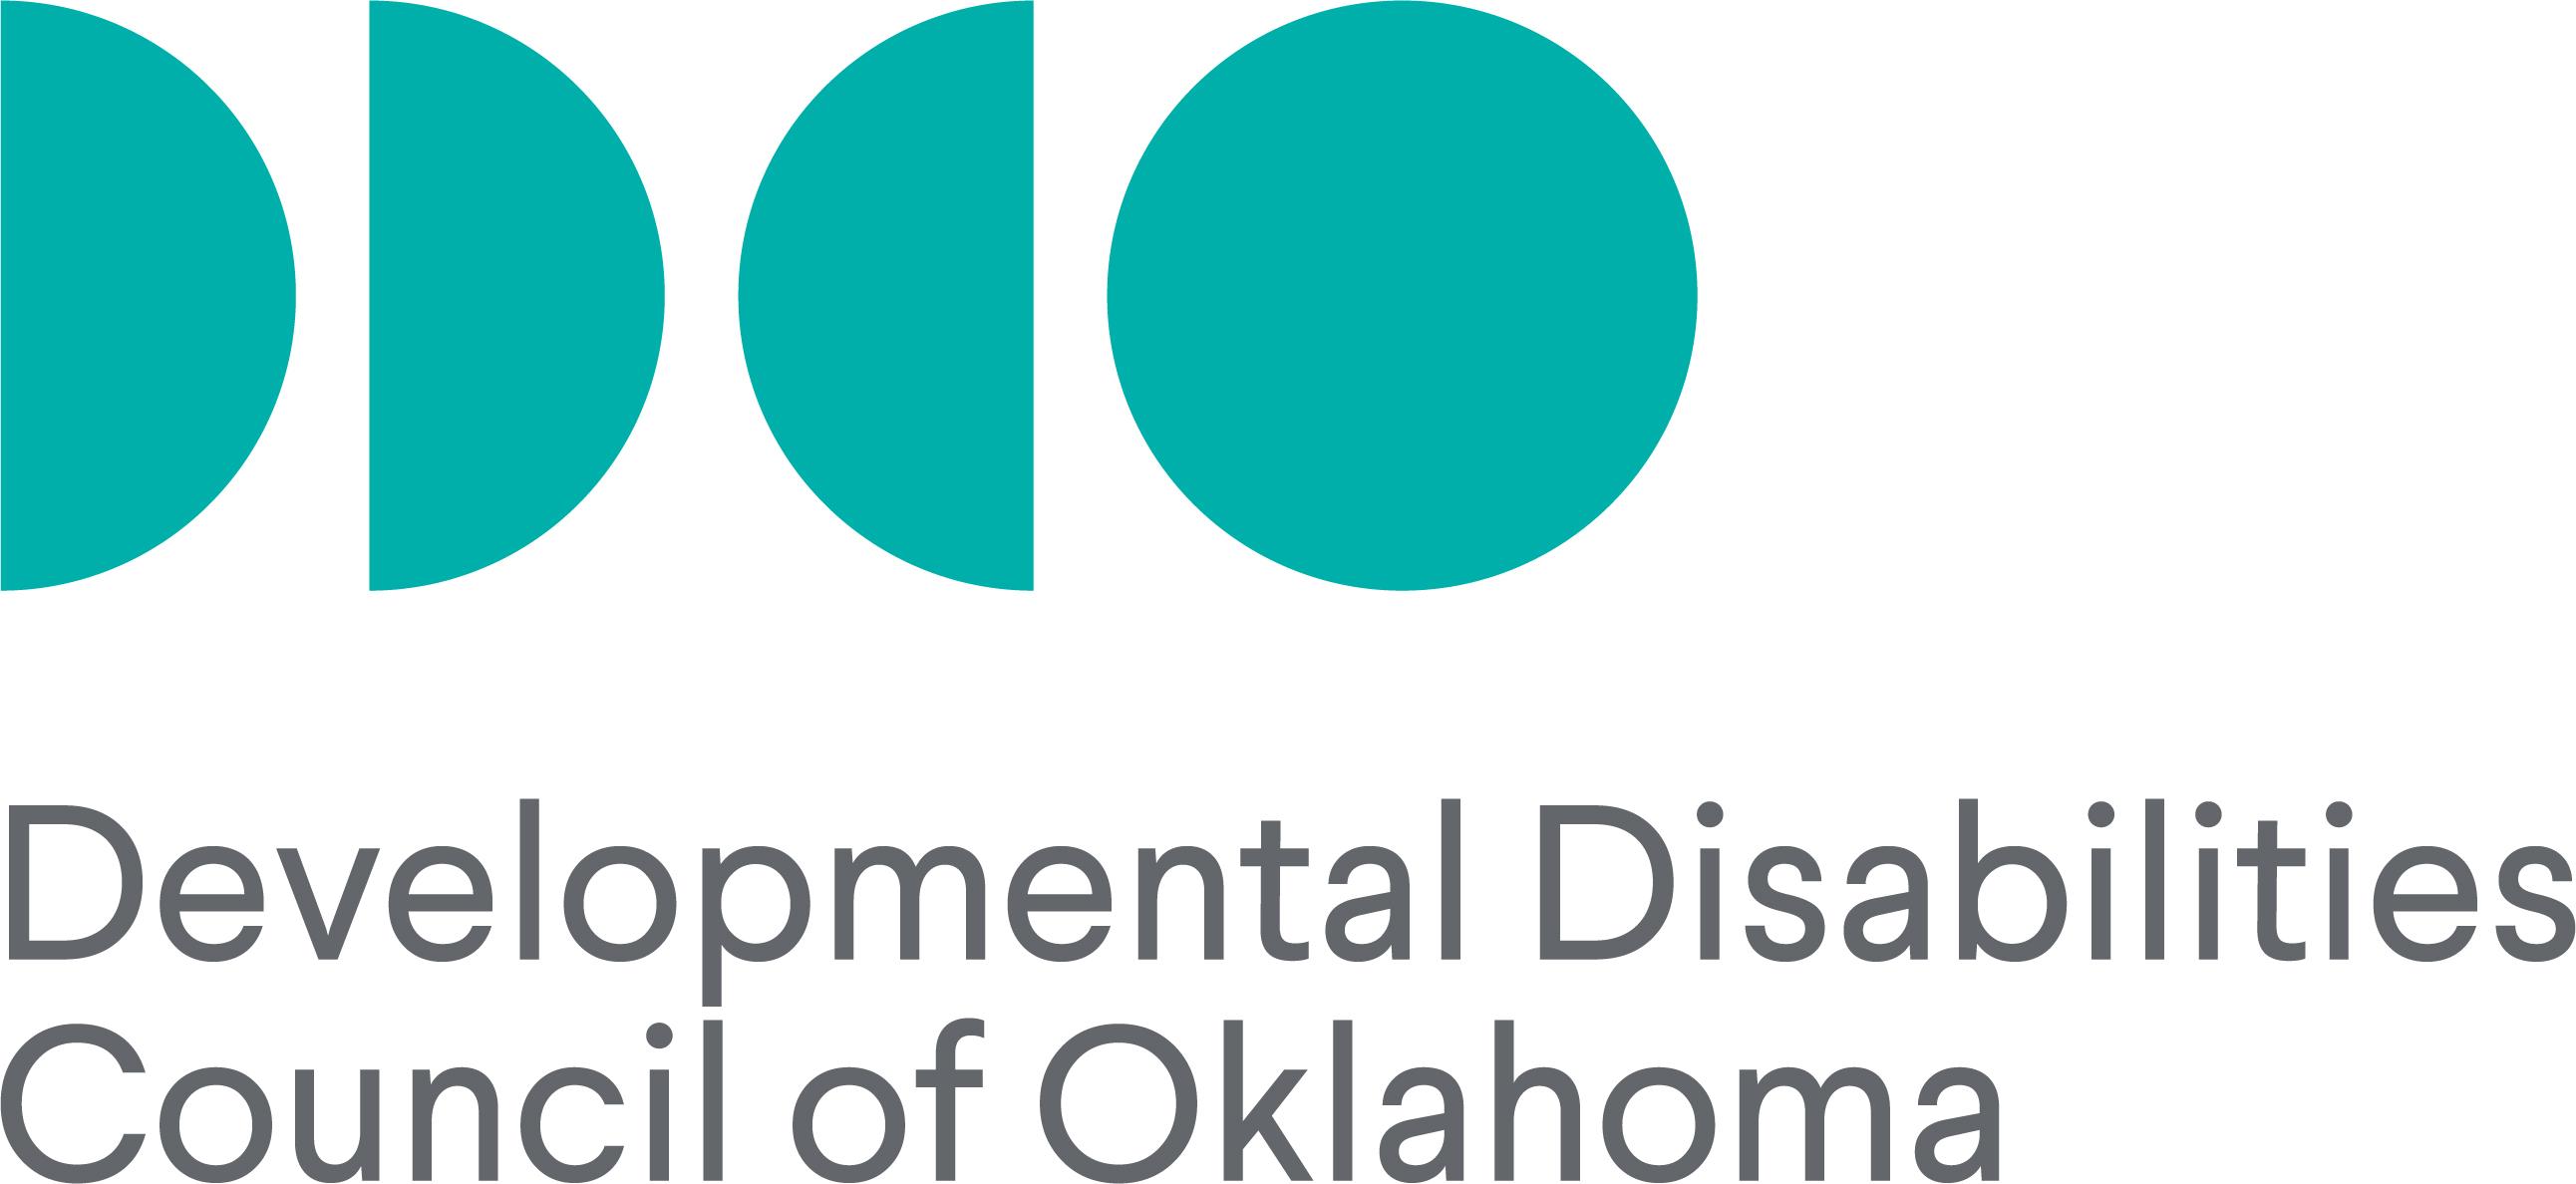 Developmental Disabilities Council of Oklahoma